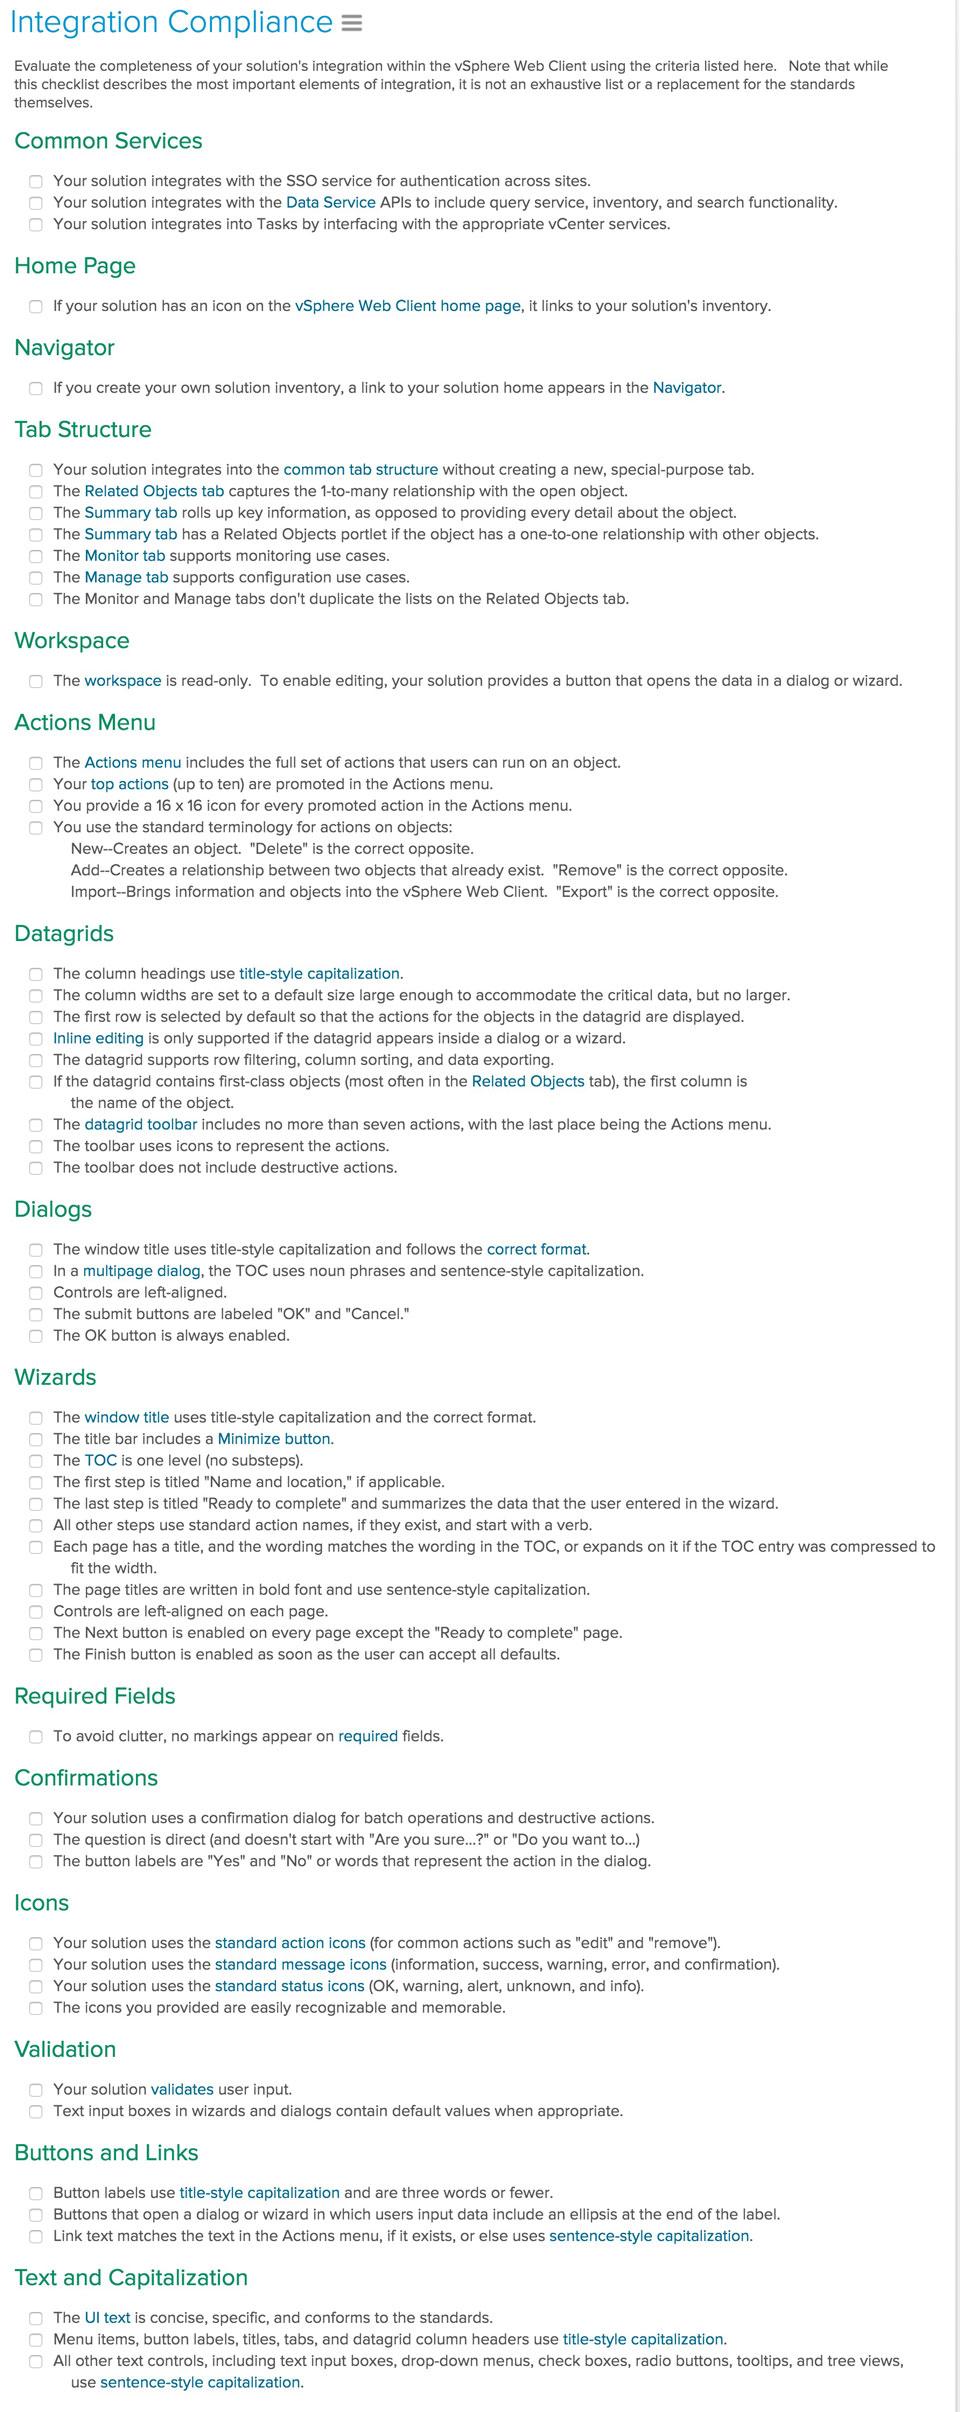 integration-compliance-checklist.jpg